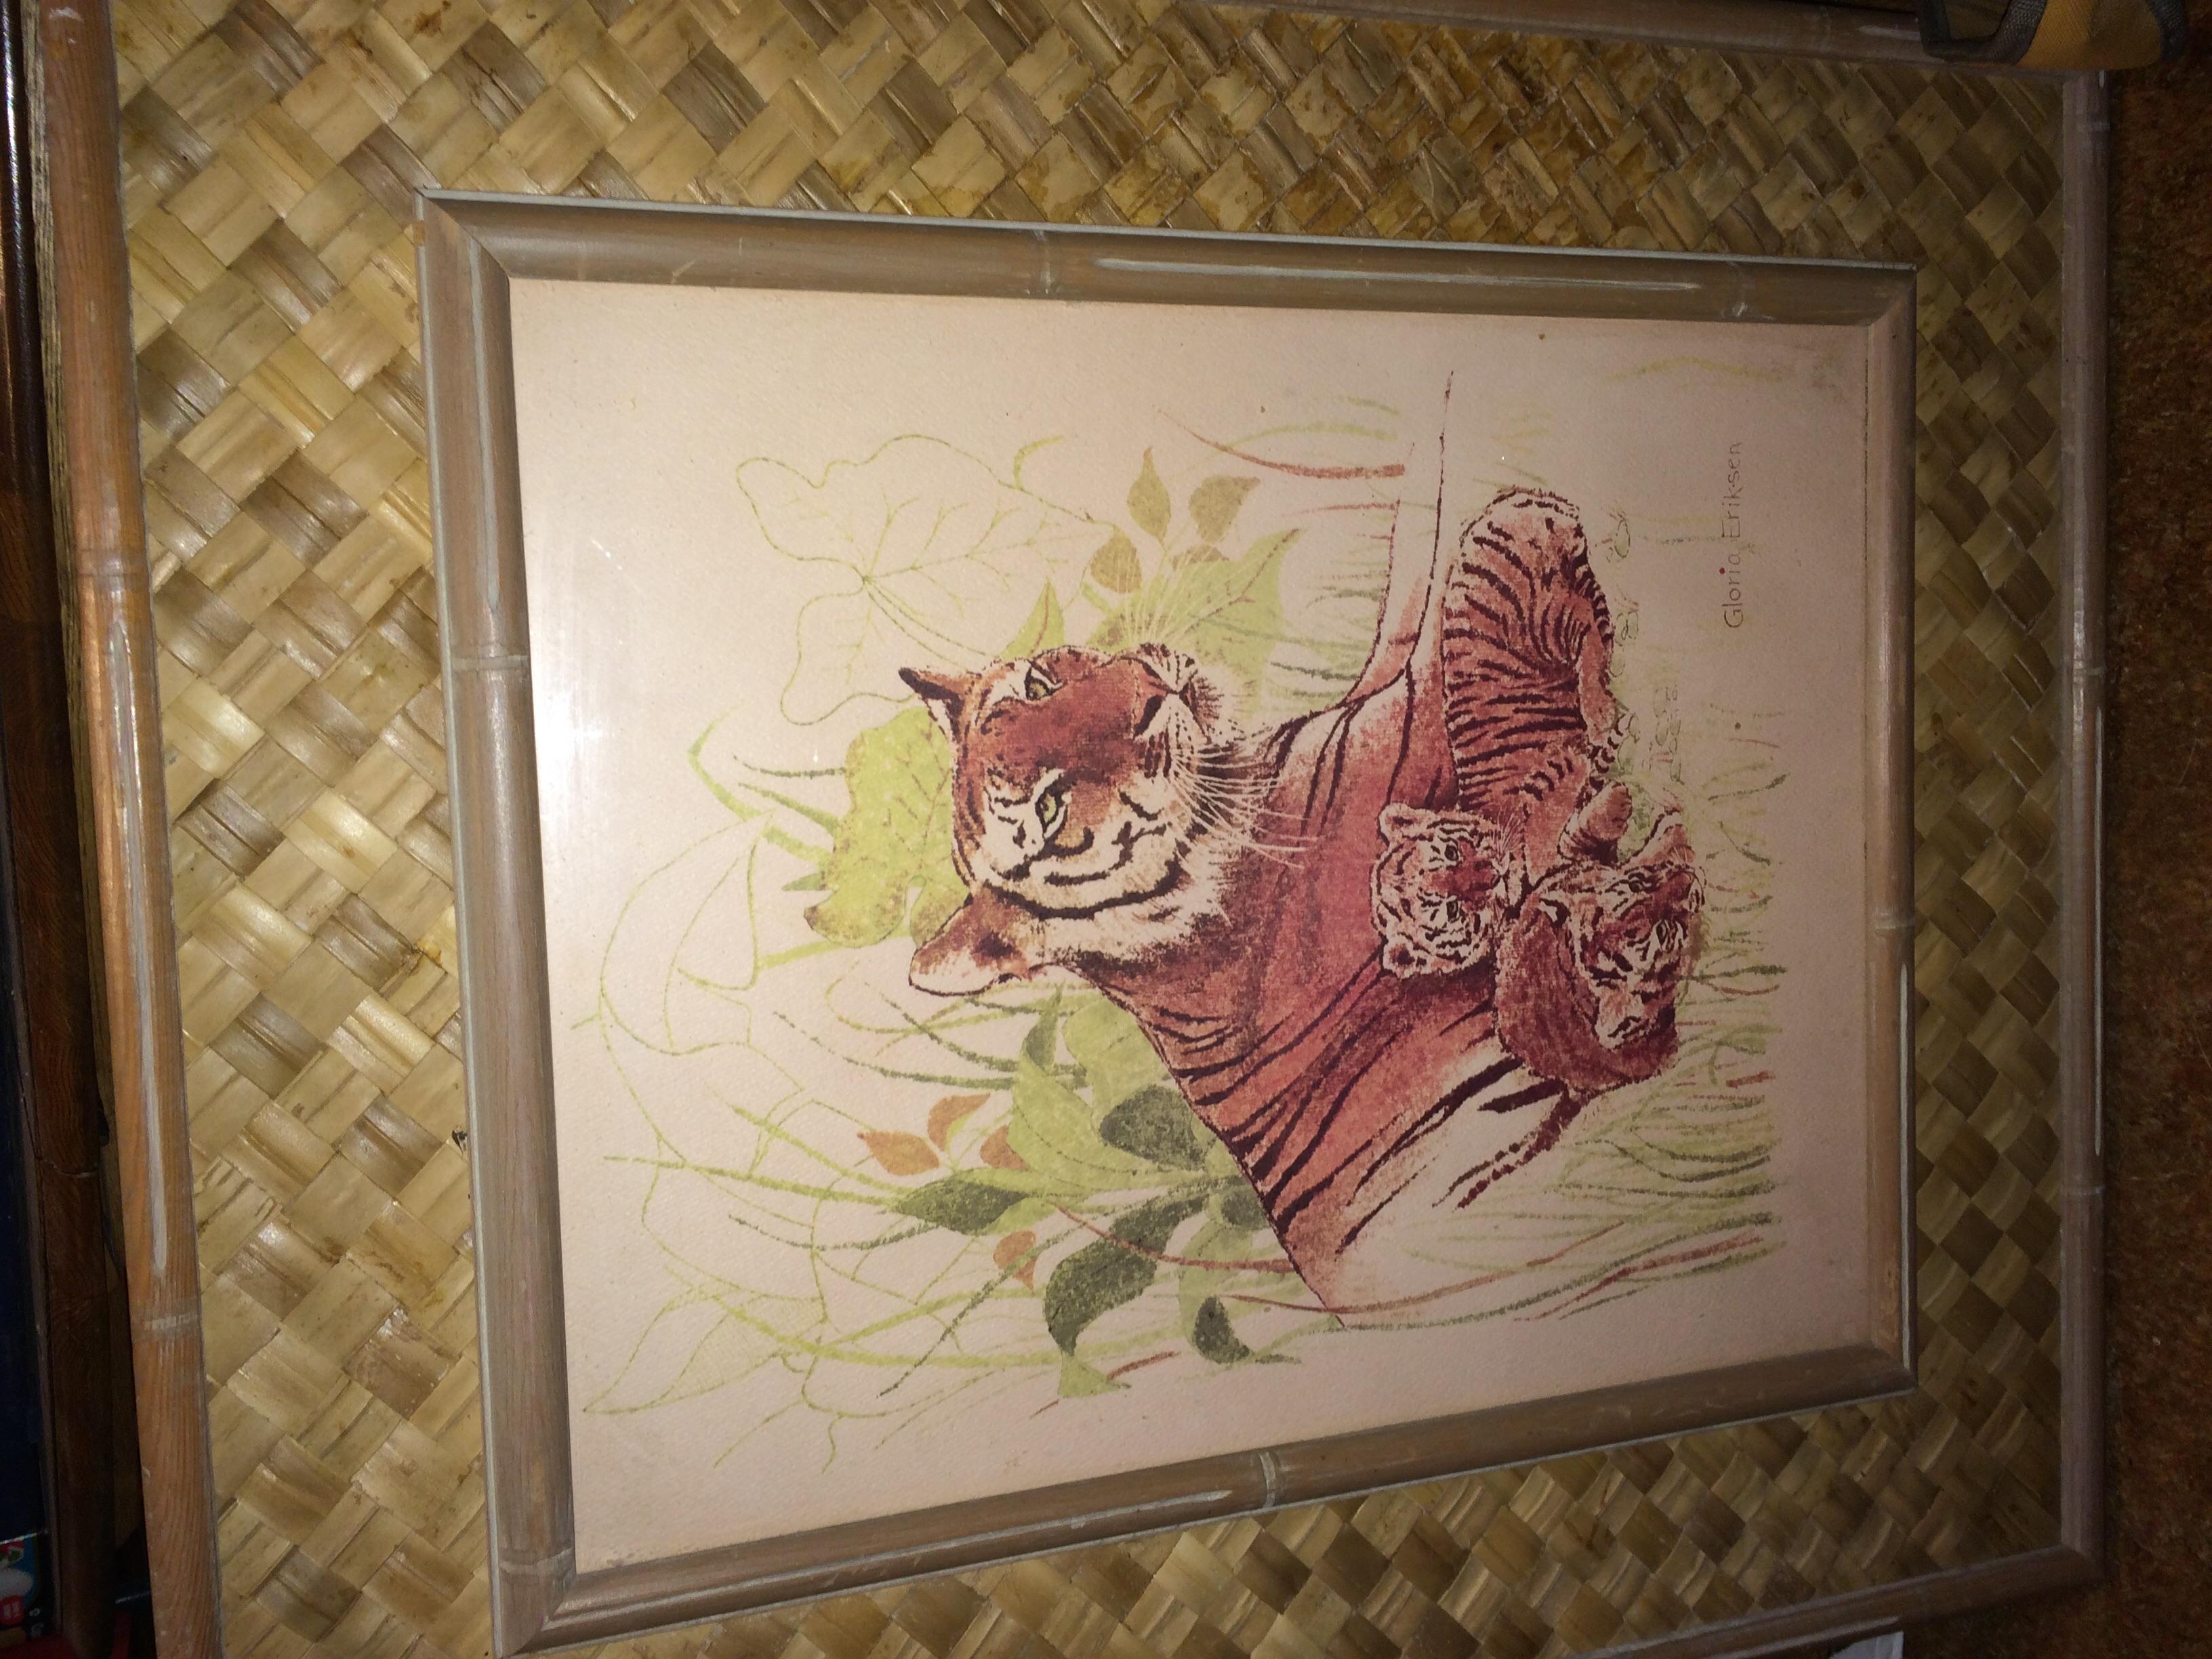 Tiger Family Antique Appraisal Instappraisal